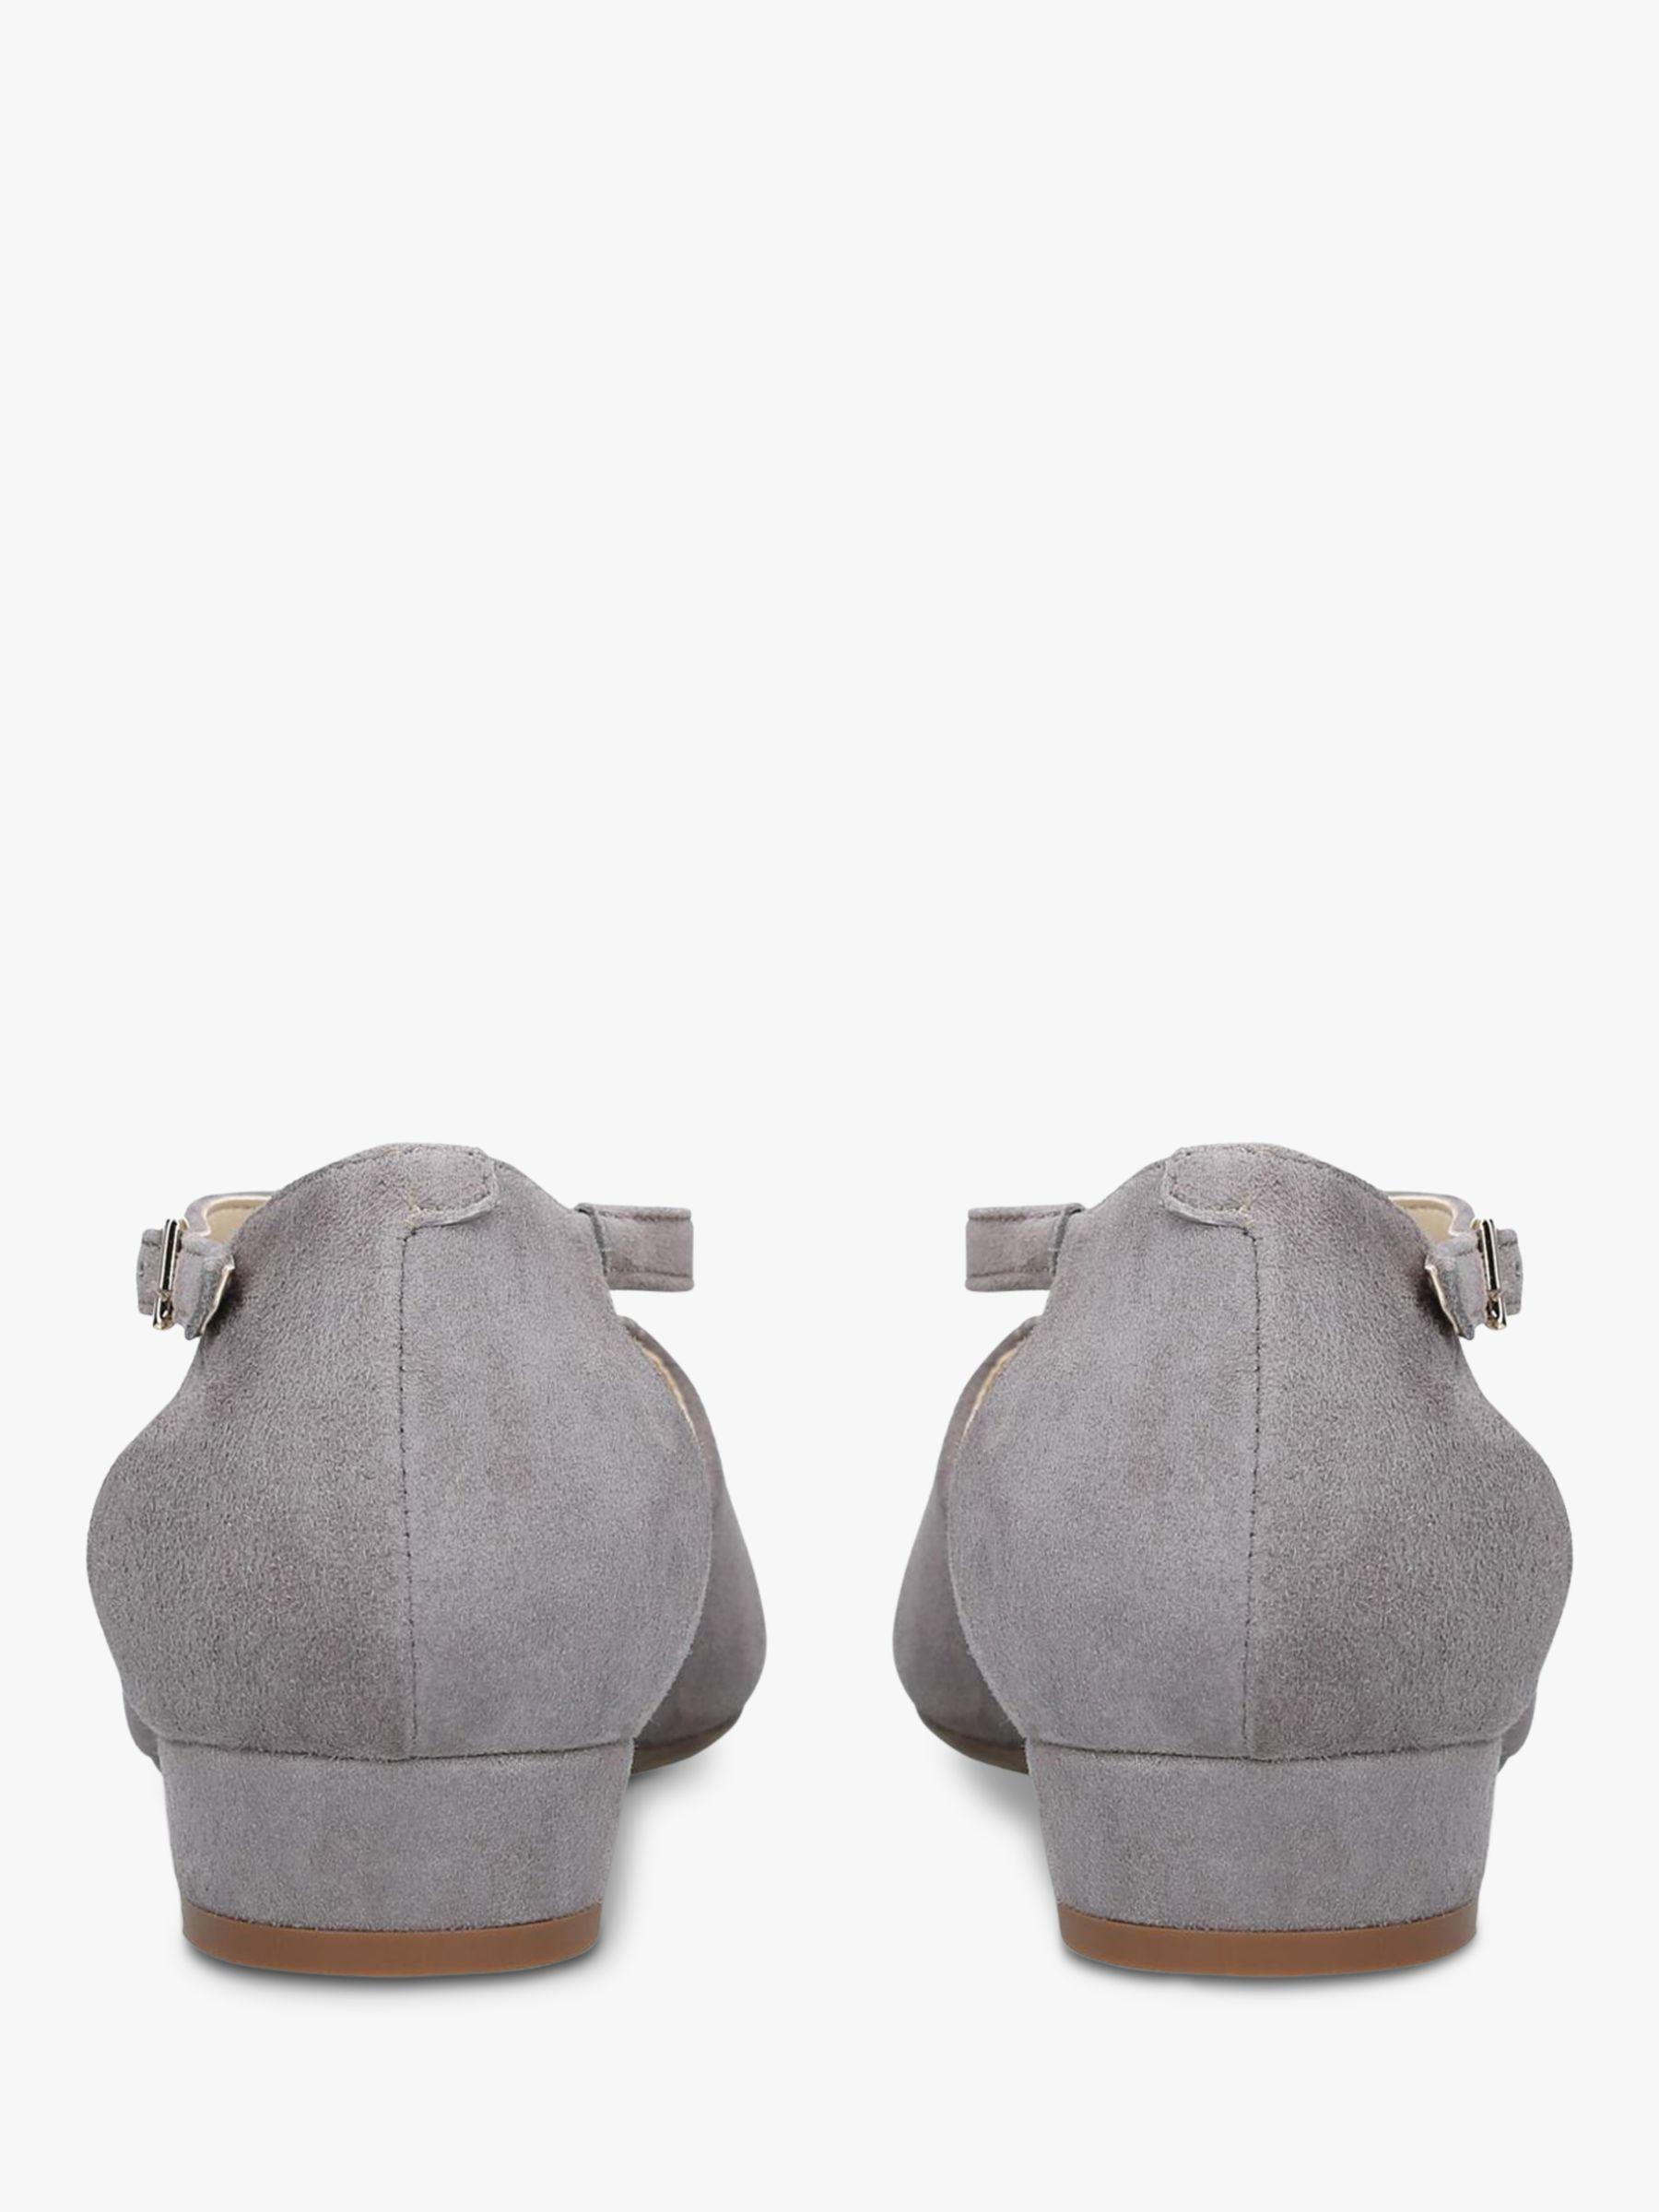 3a69a1cc798 Carvela Kurt Geiger - Multicolor Comfort Amour Low Heel Court Shoes - Lyst.  View fullscreen